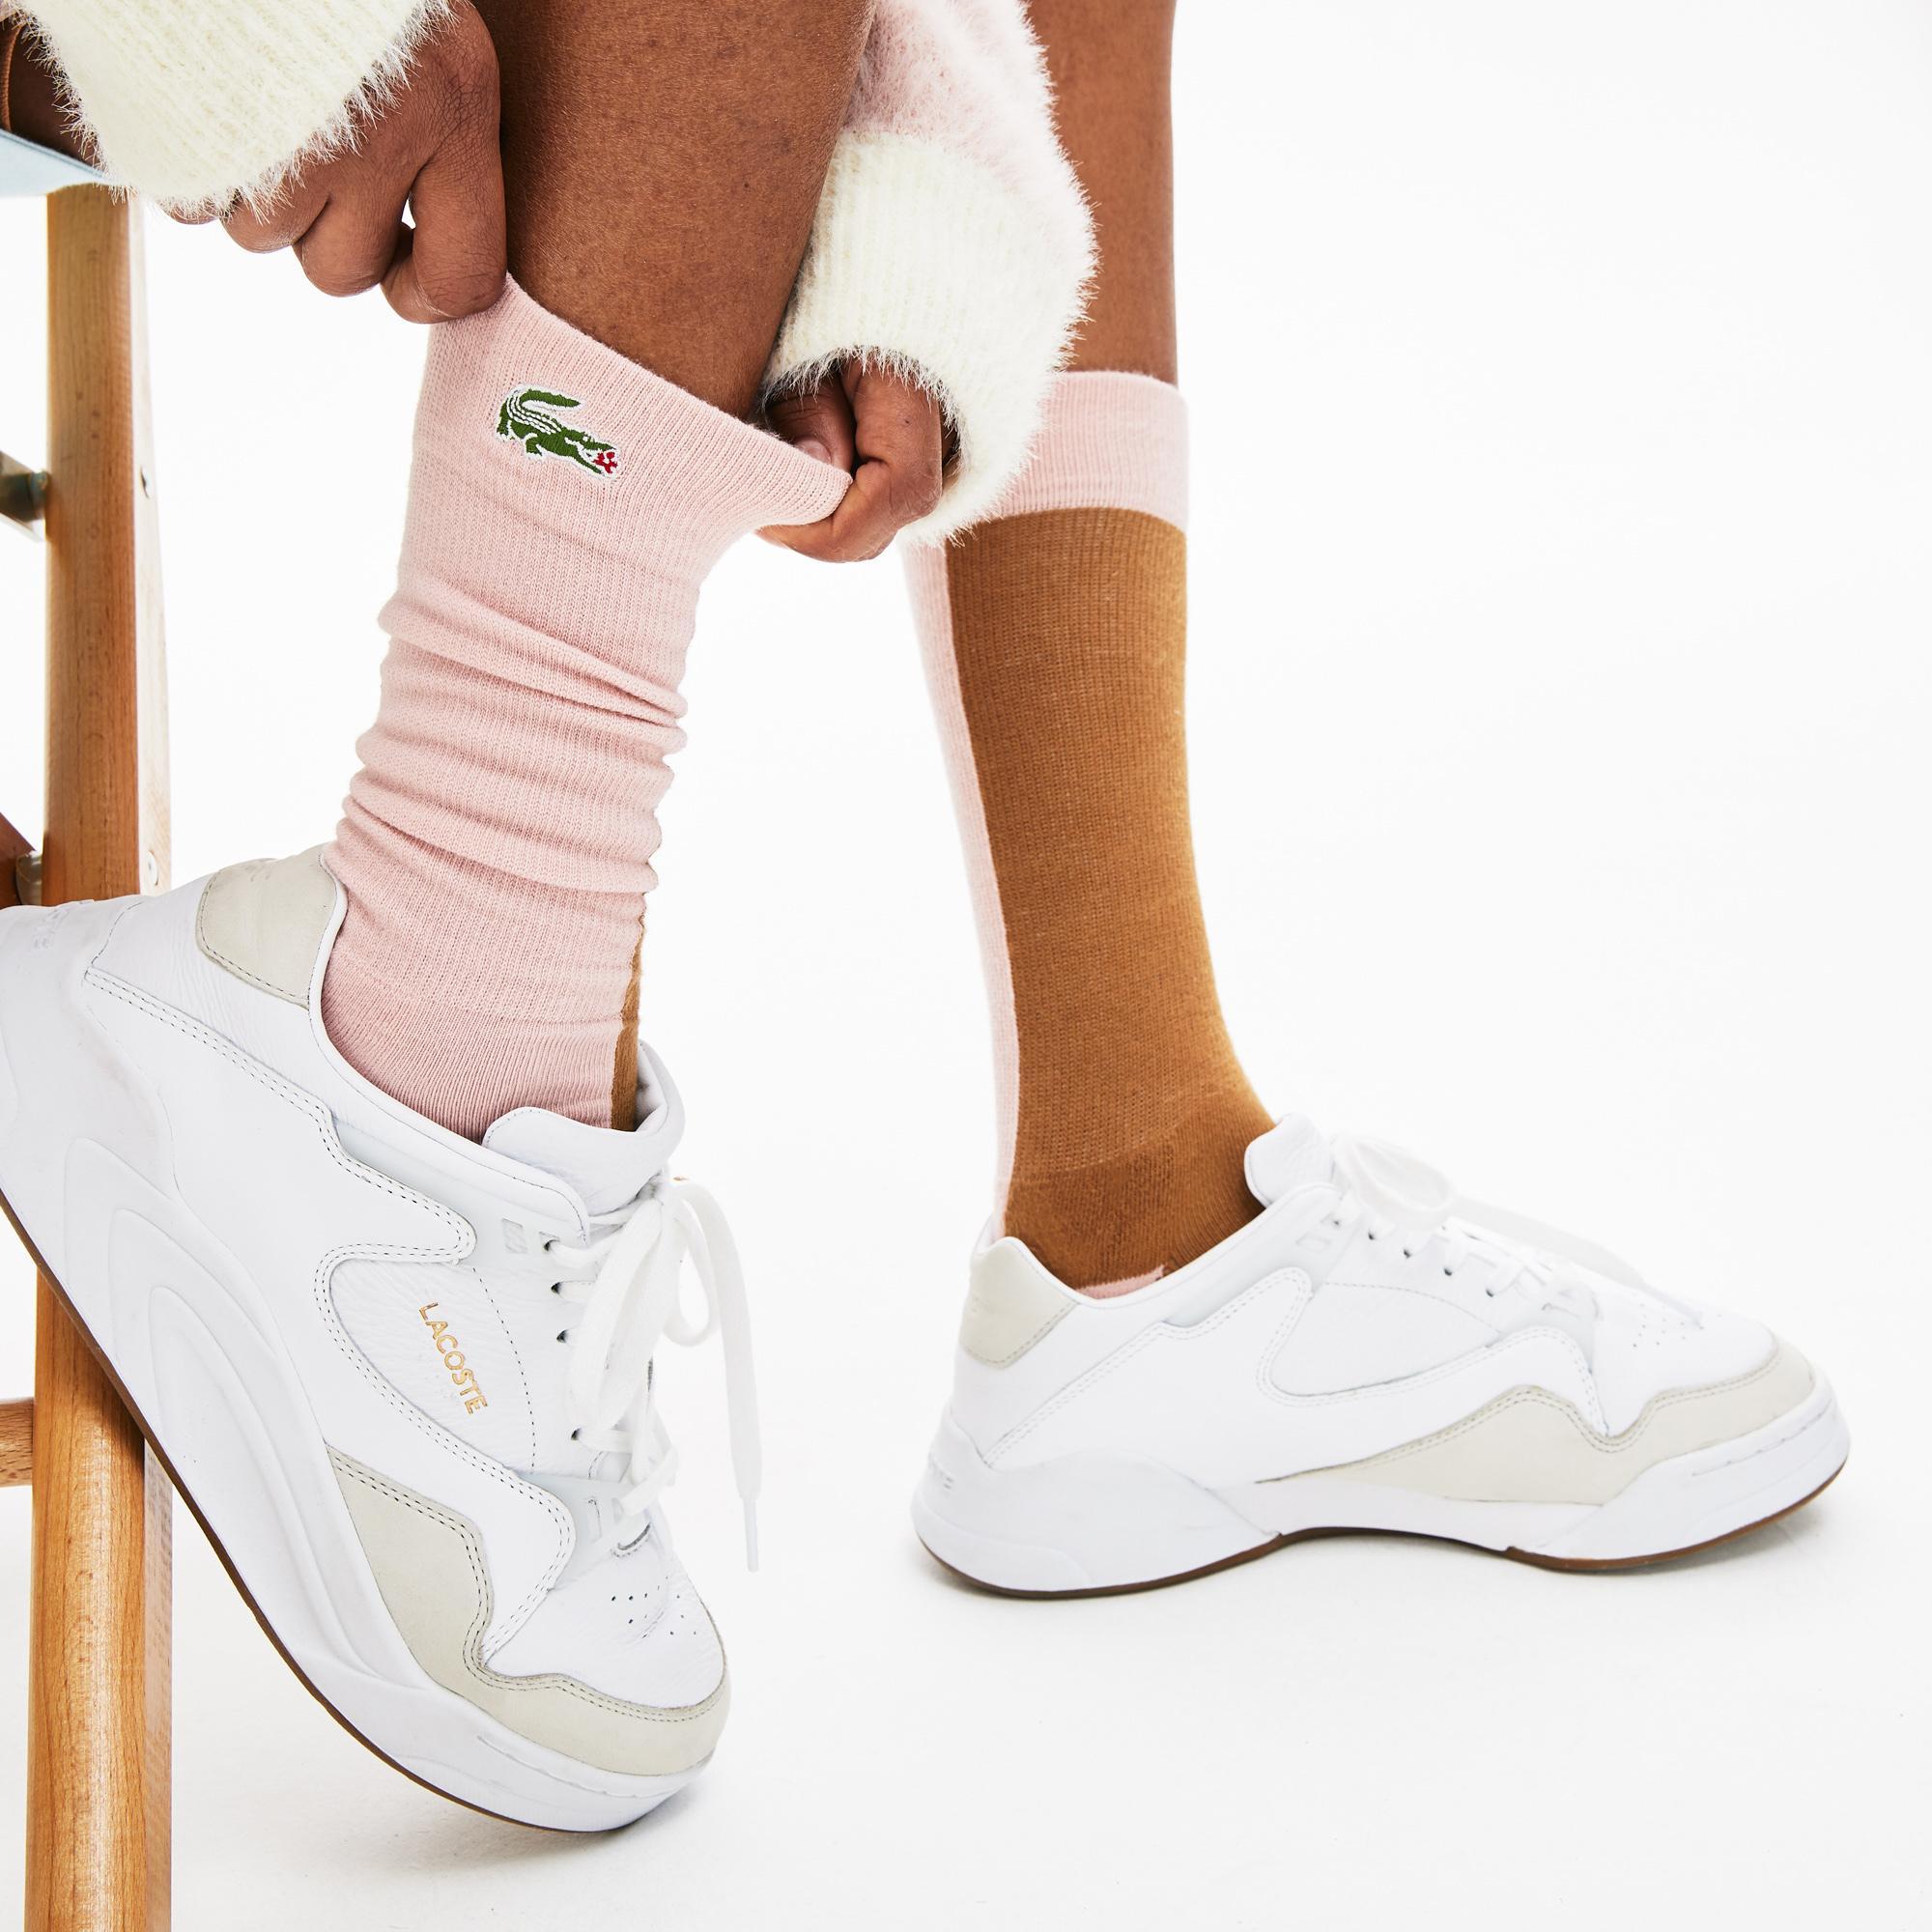 Lacoste X GOLF le FLEUR Unisex Pembe - Kahverengi Çorap